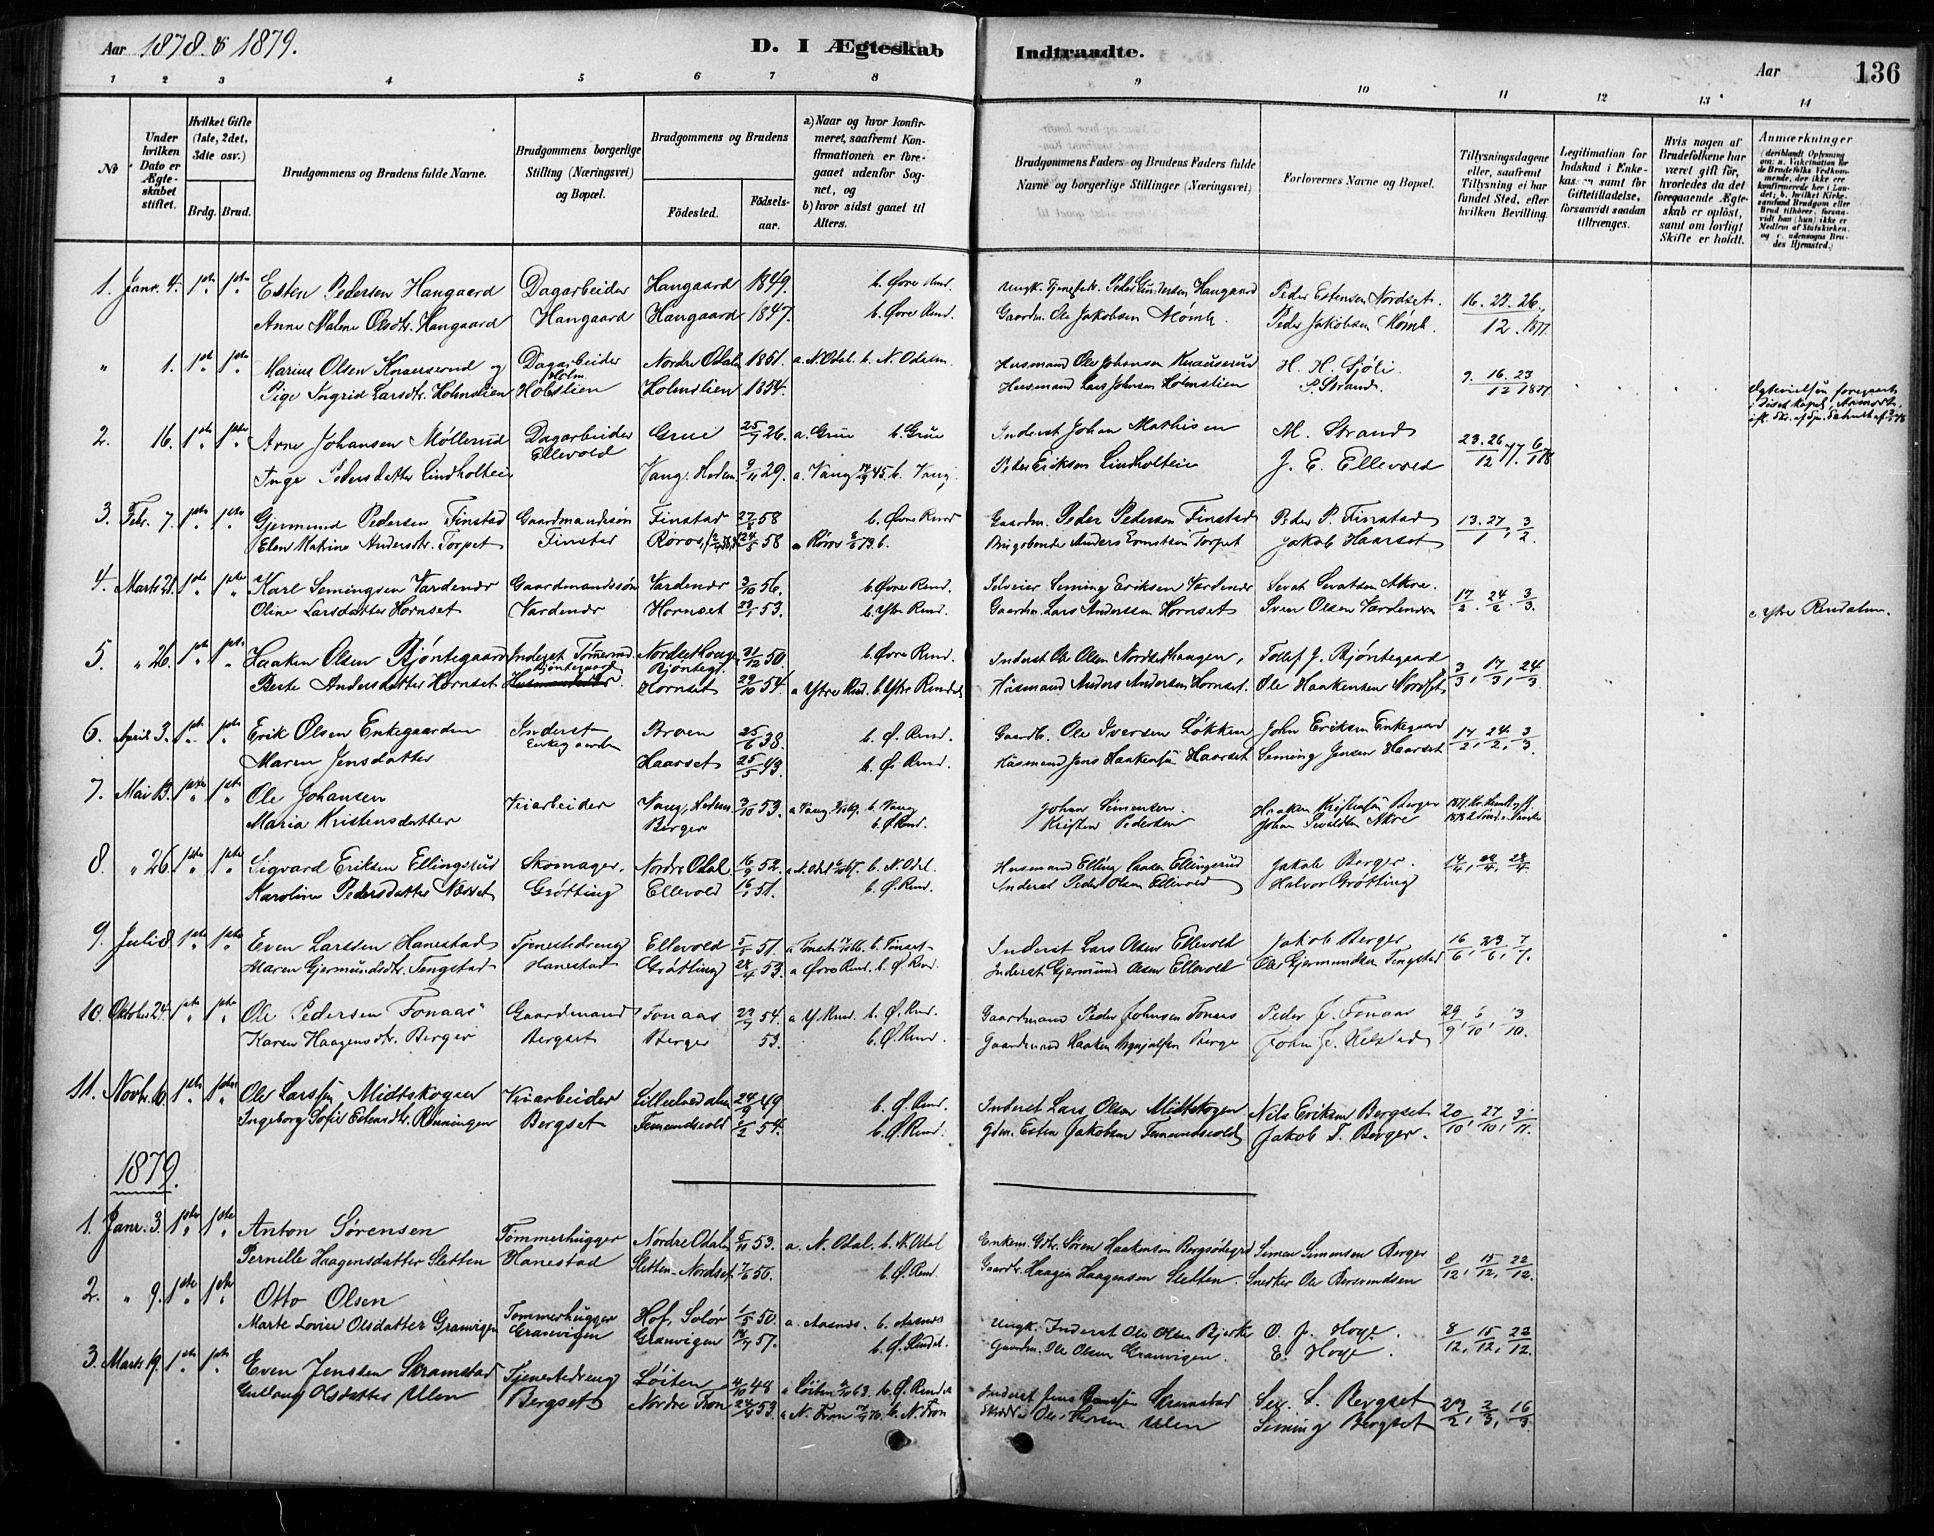 SAH, Rendalen prestekontor, H/Ha/Haa/L0009: Ministerialbok nr. 9, 1878-1901, s. 136